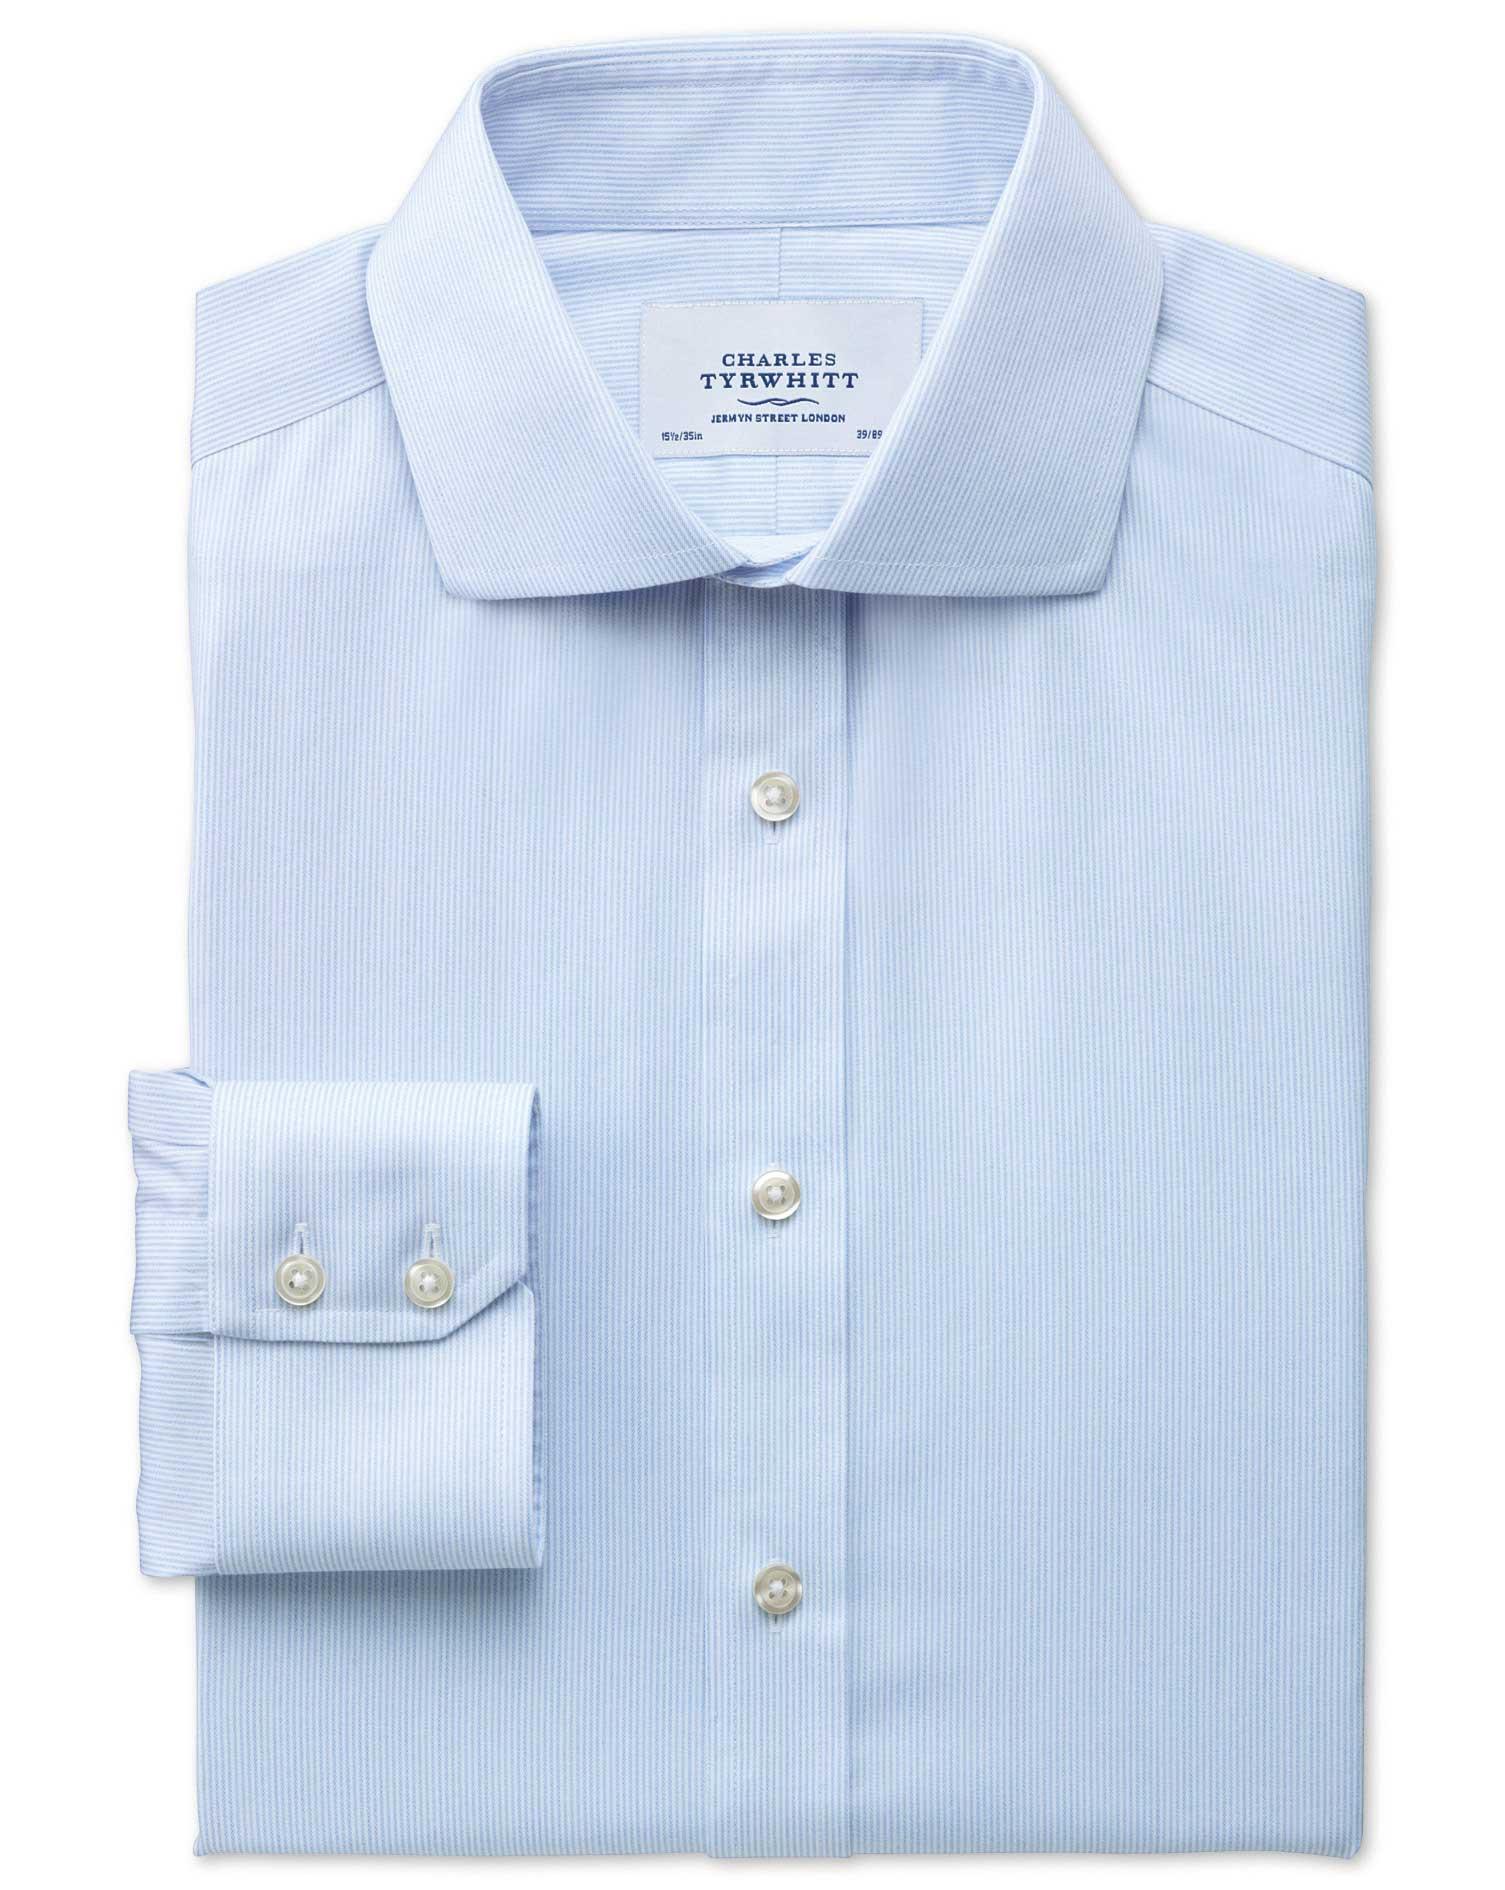 Slim Fit Cutaway Collar Non-Iron Mouline Stripe Sky Blue Cotton Formal Shirt Single Cuff Size 16.5/3